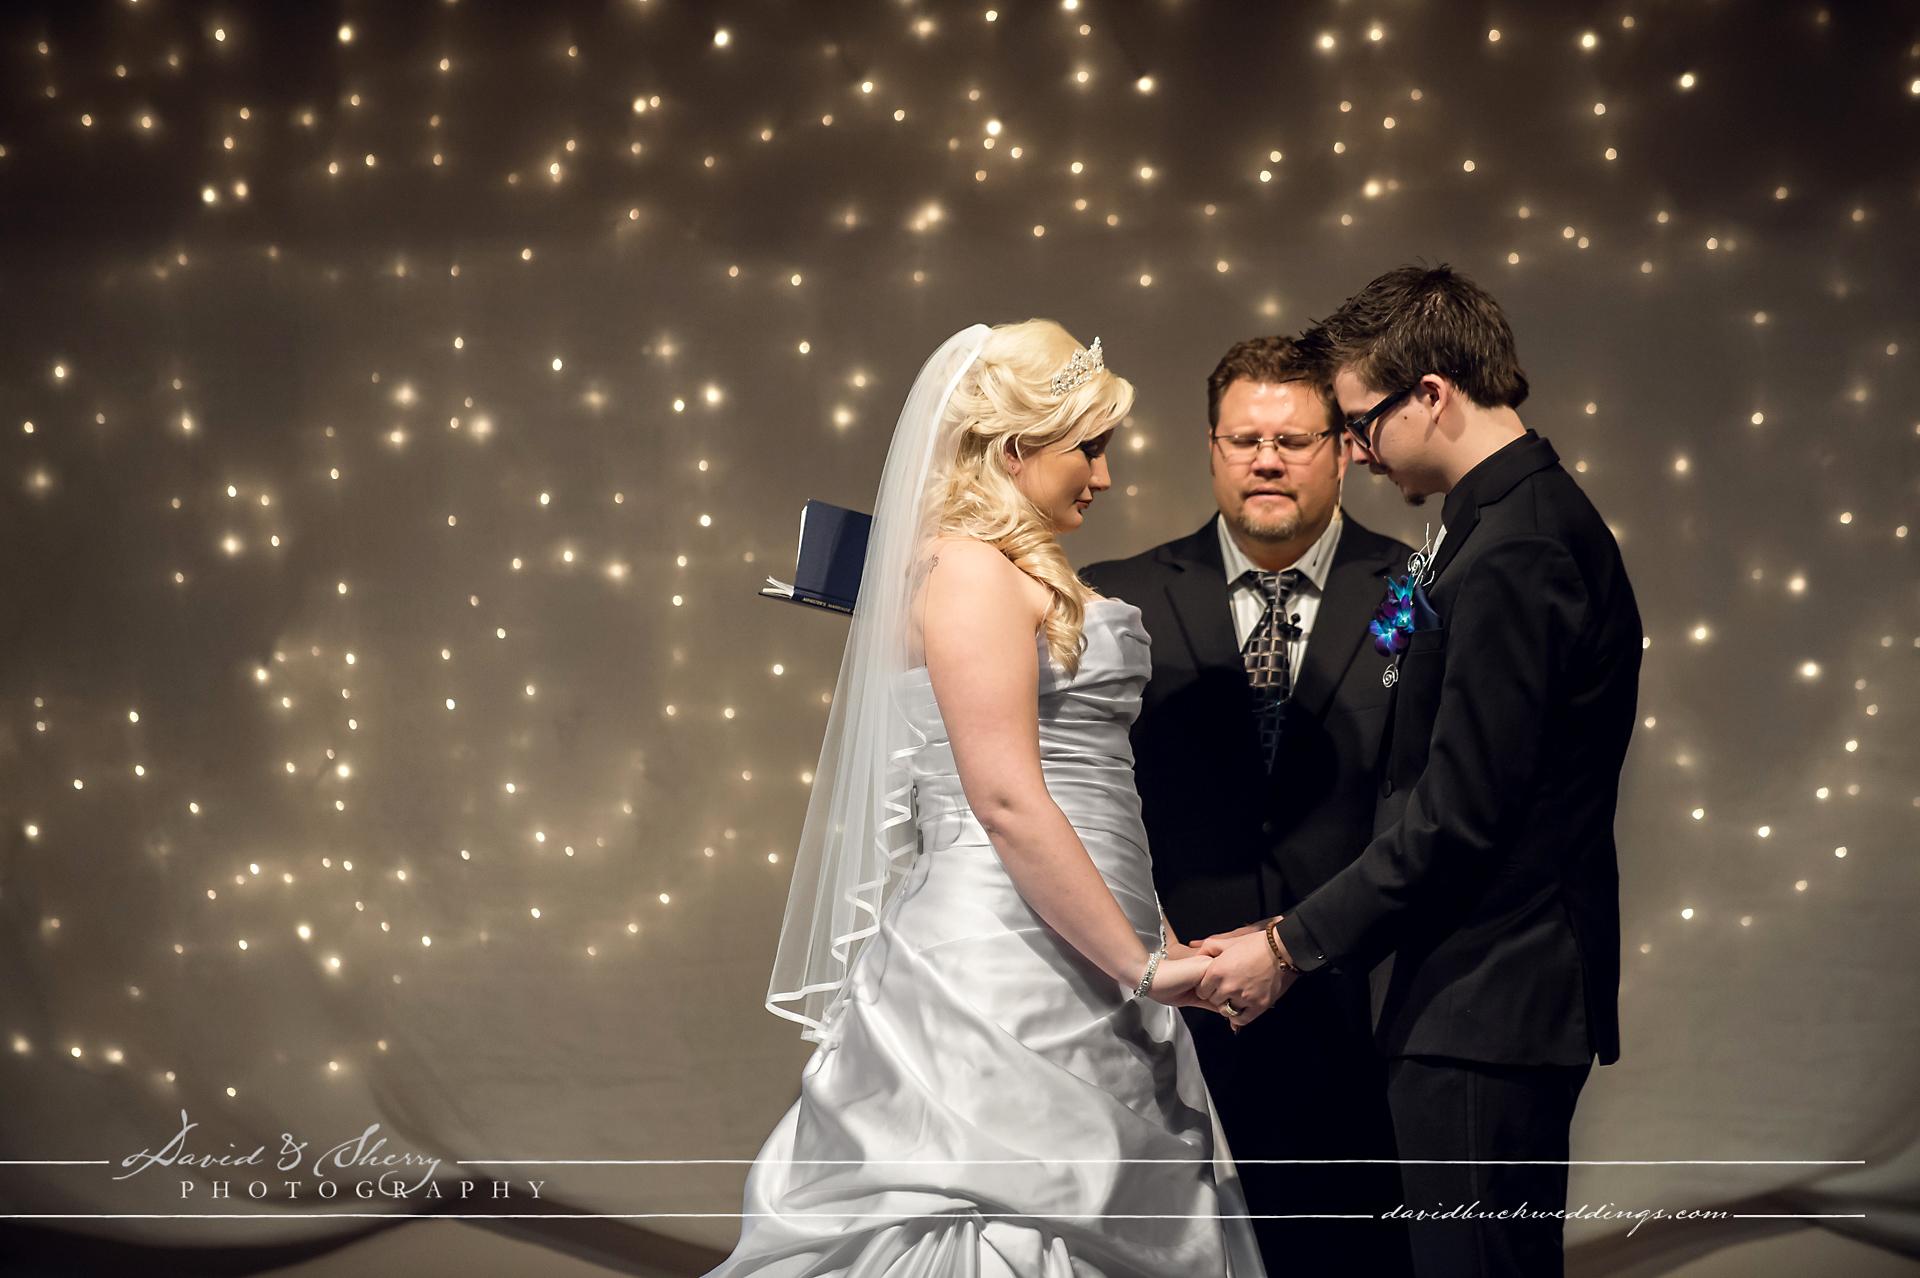 Abbotsford_Wedding_Photography_Secret_Garden_13